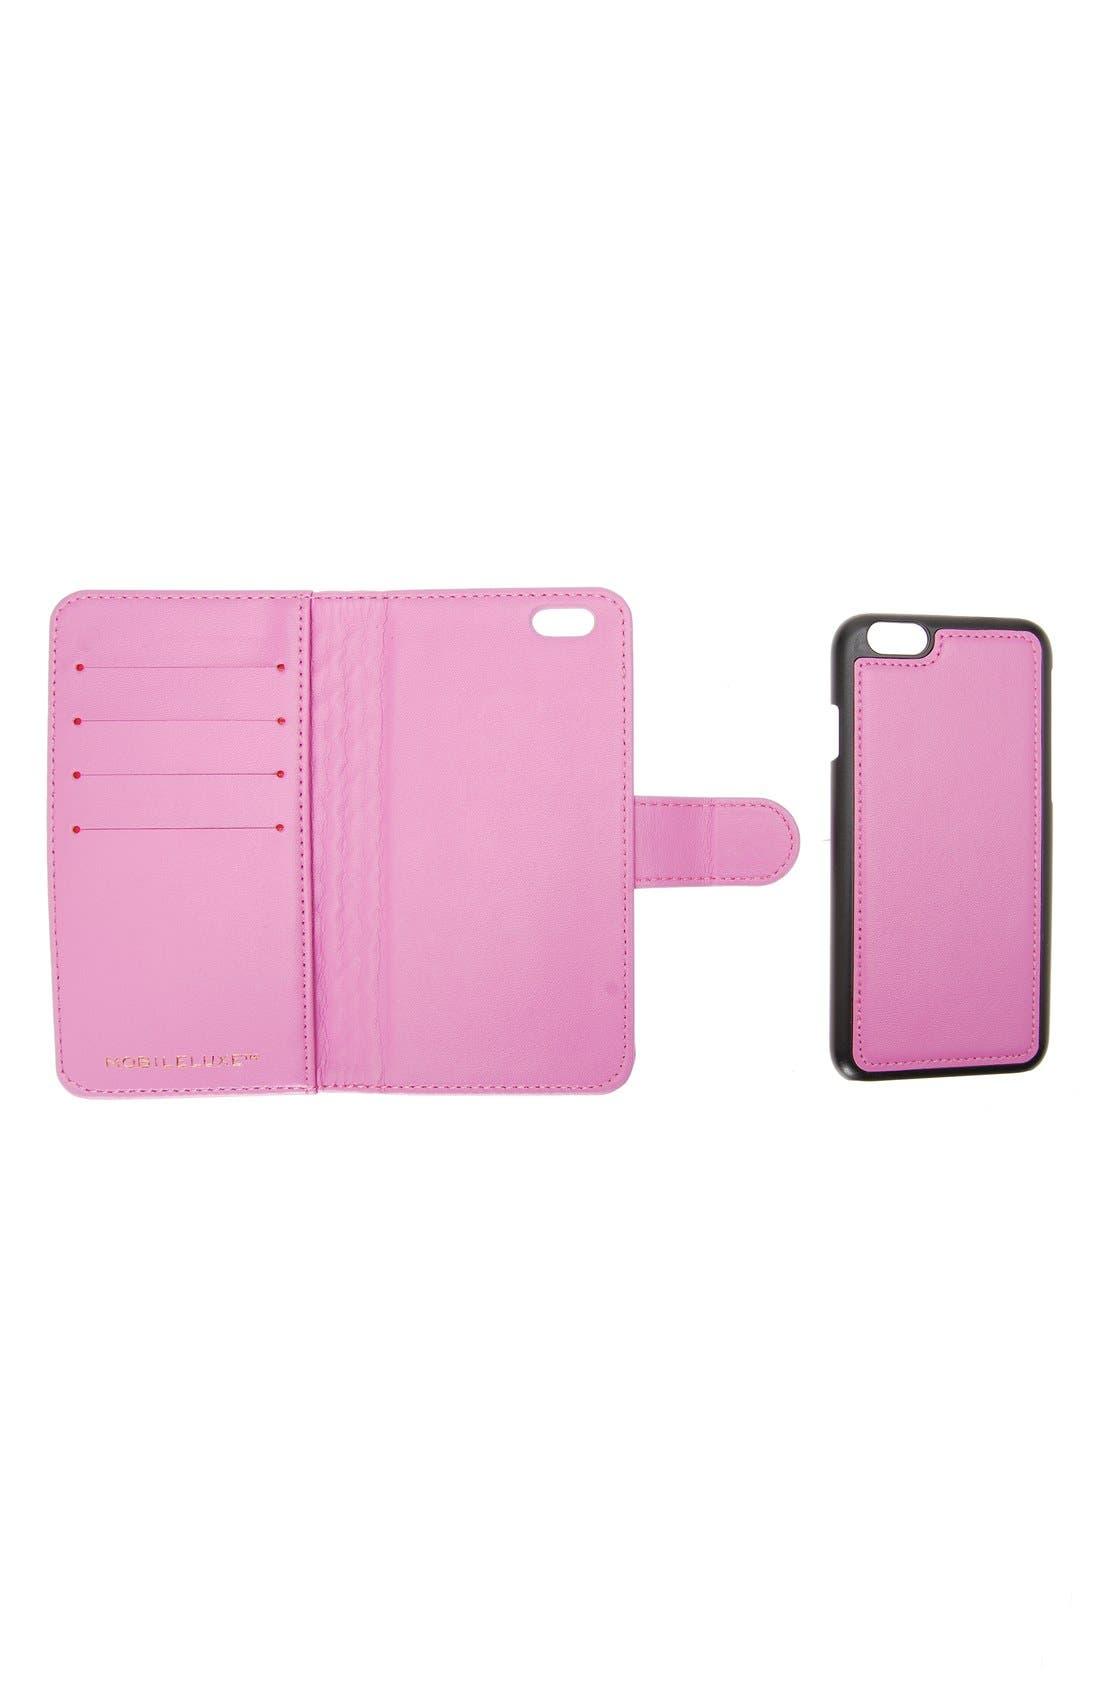 iPhone 6/6s Wallet Case,                             Alternate thumbnail 2, color,                             650